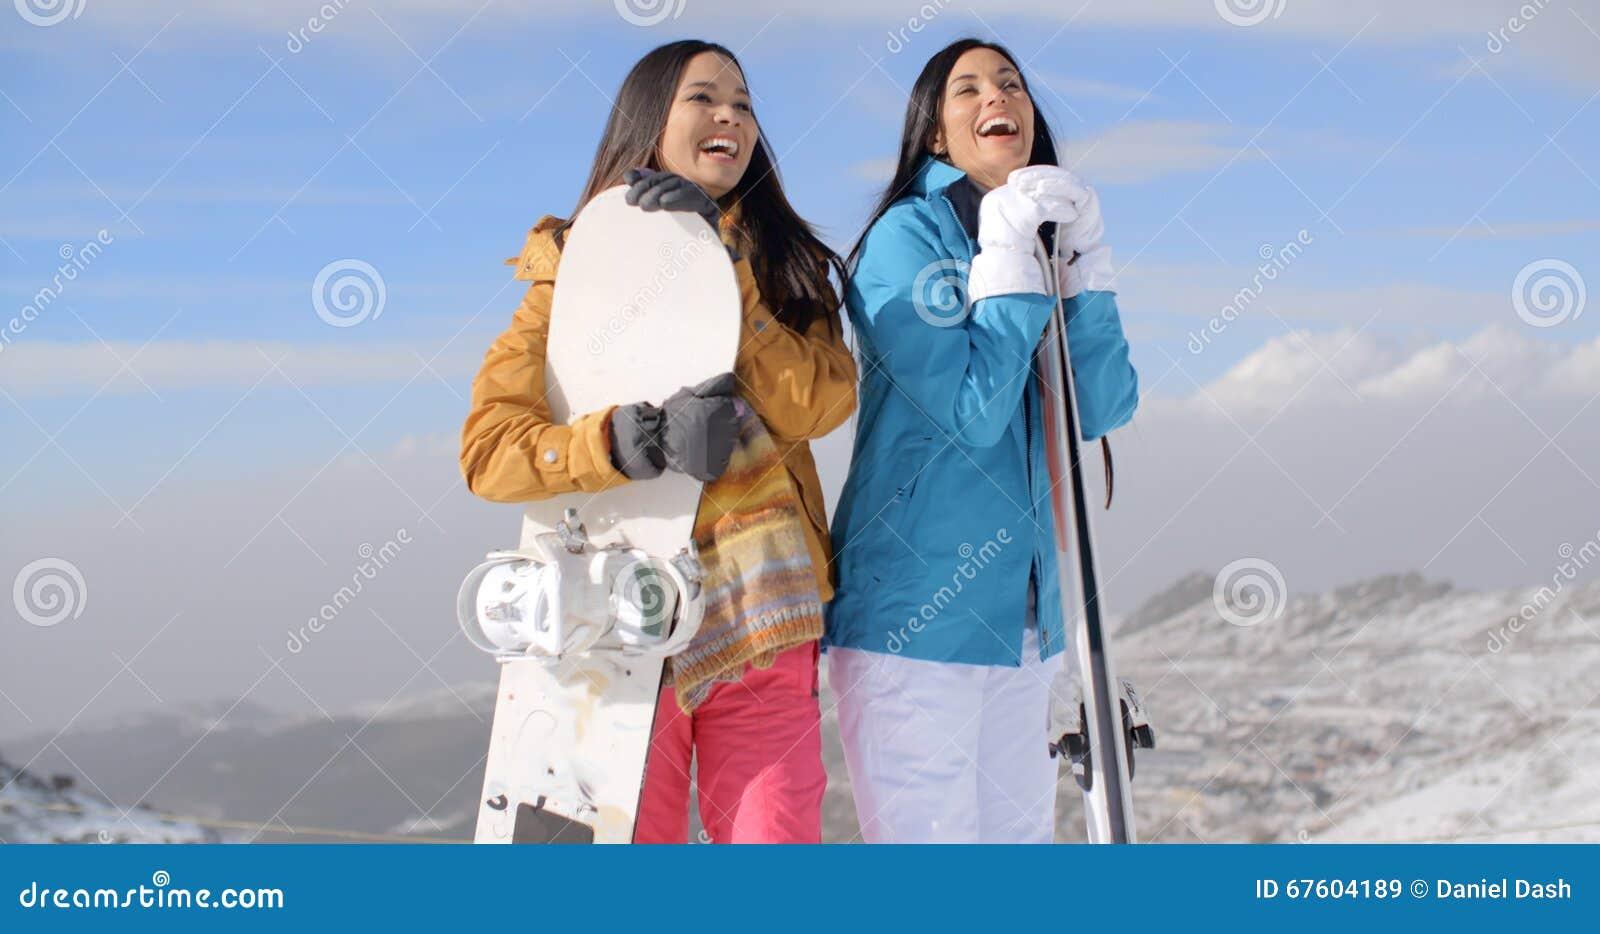 53a1fbf20 snowboard pose - Ecosia